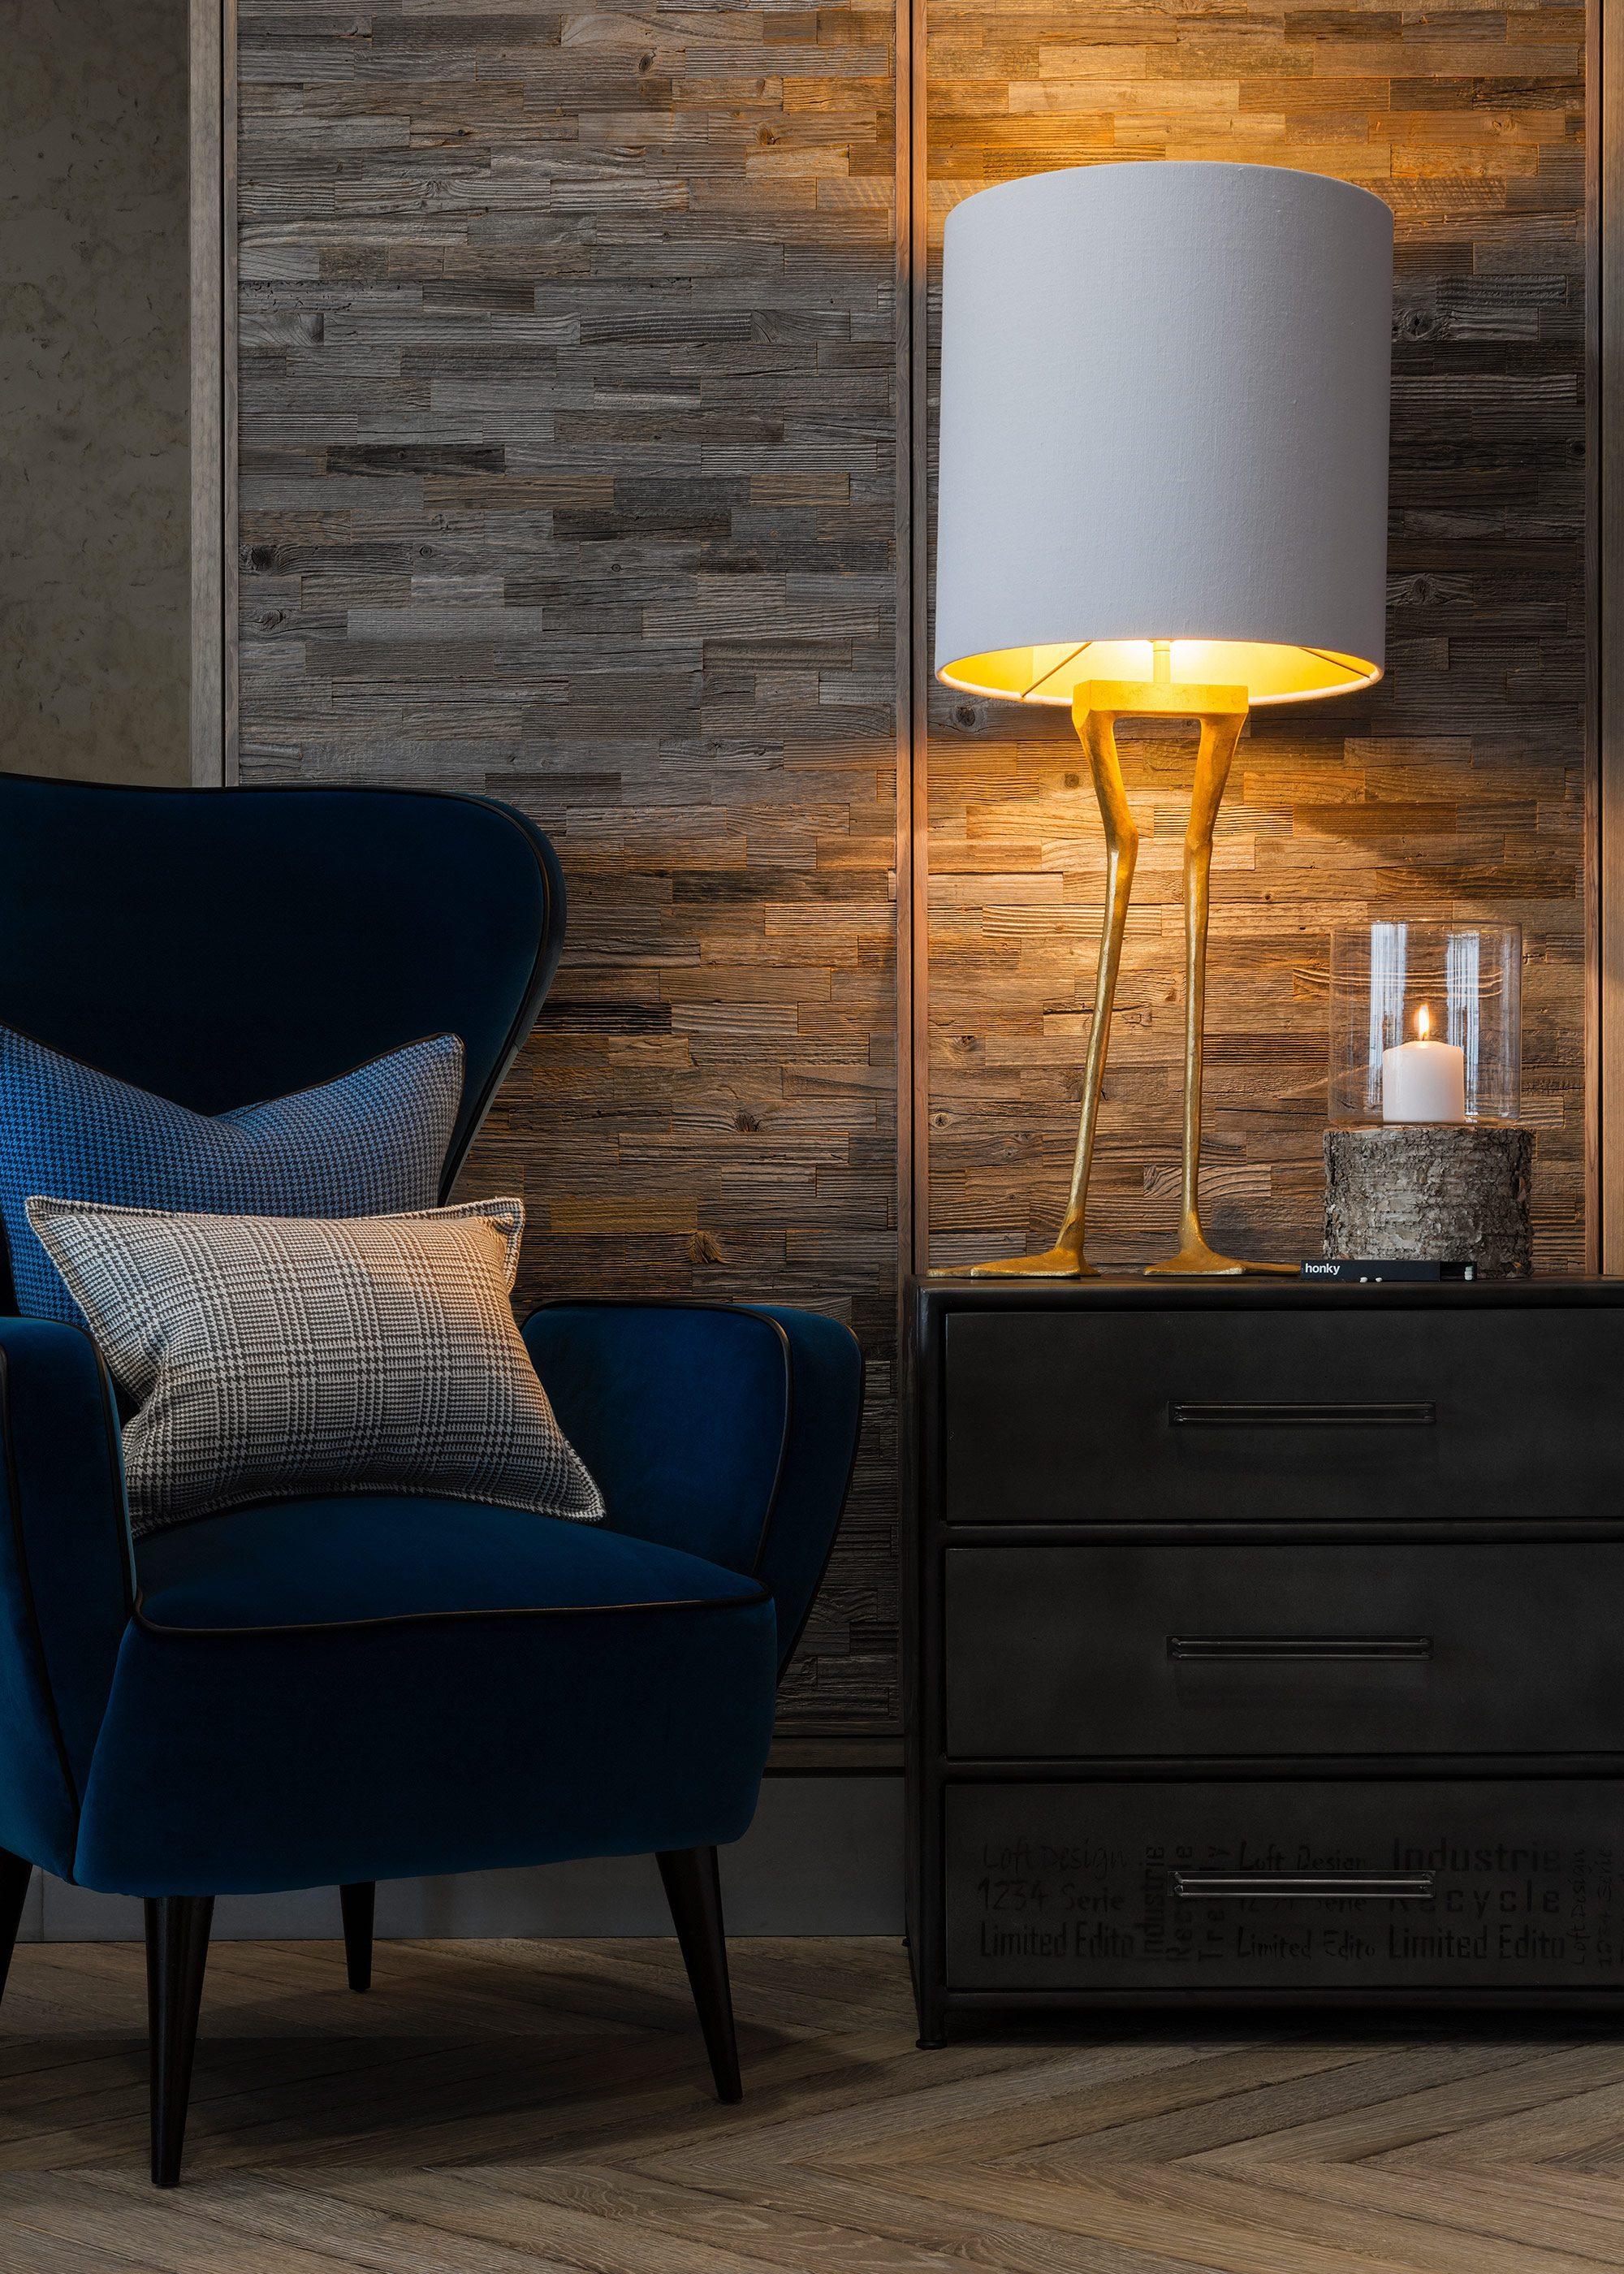 Honky Interior Design Marketing Suites Knights Wood Royal Tunbridge Wells Portrait Portrait 1a